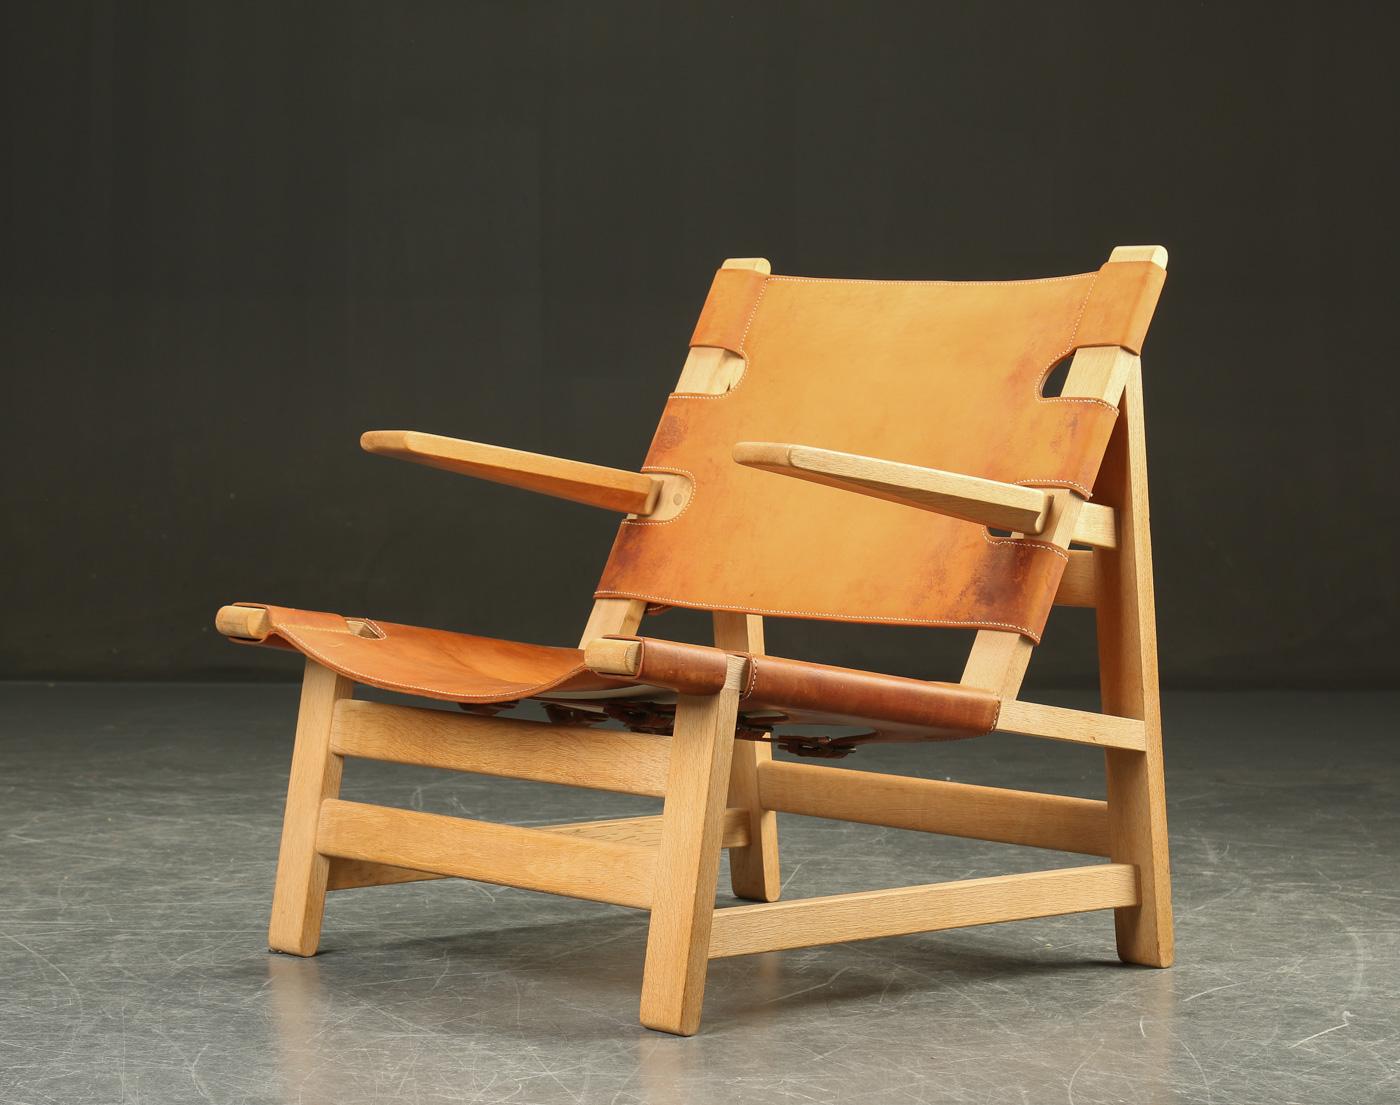 børge mogensen lænestol Auktionstipset   Børge Mogensen. Lænestol af eg og kernelæder  børge mogensen lænestol